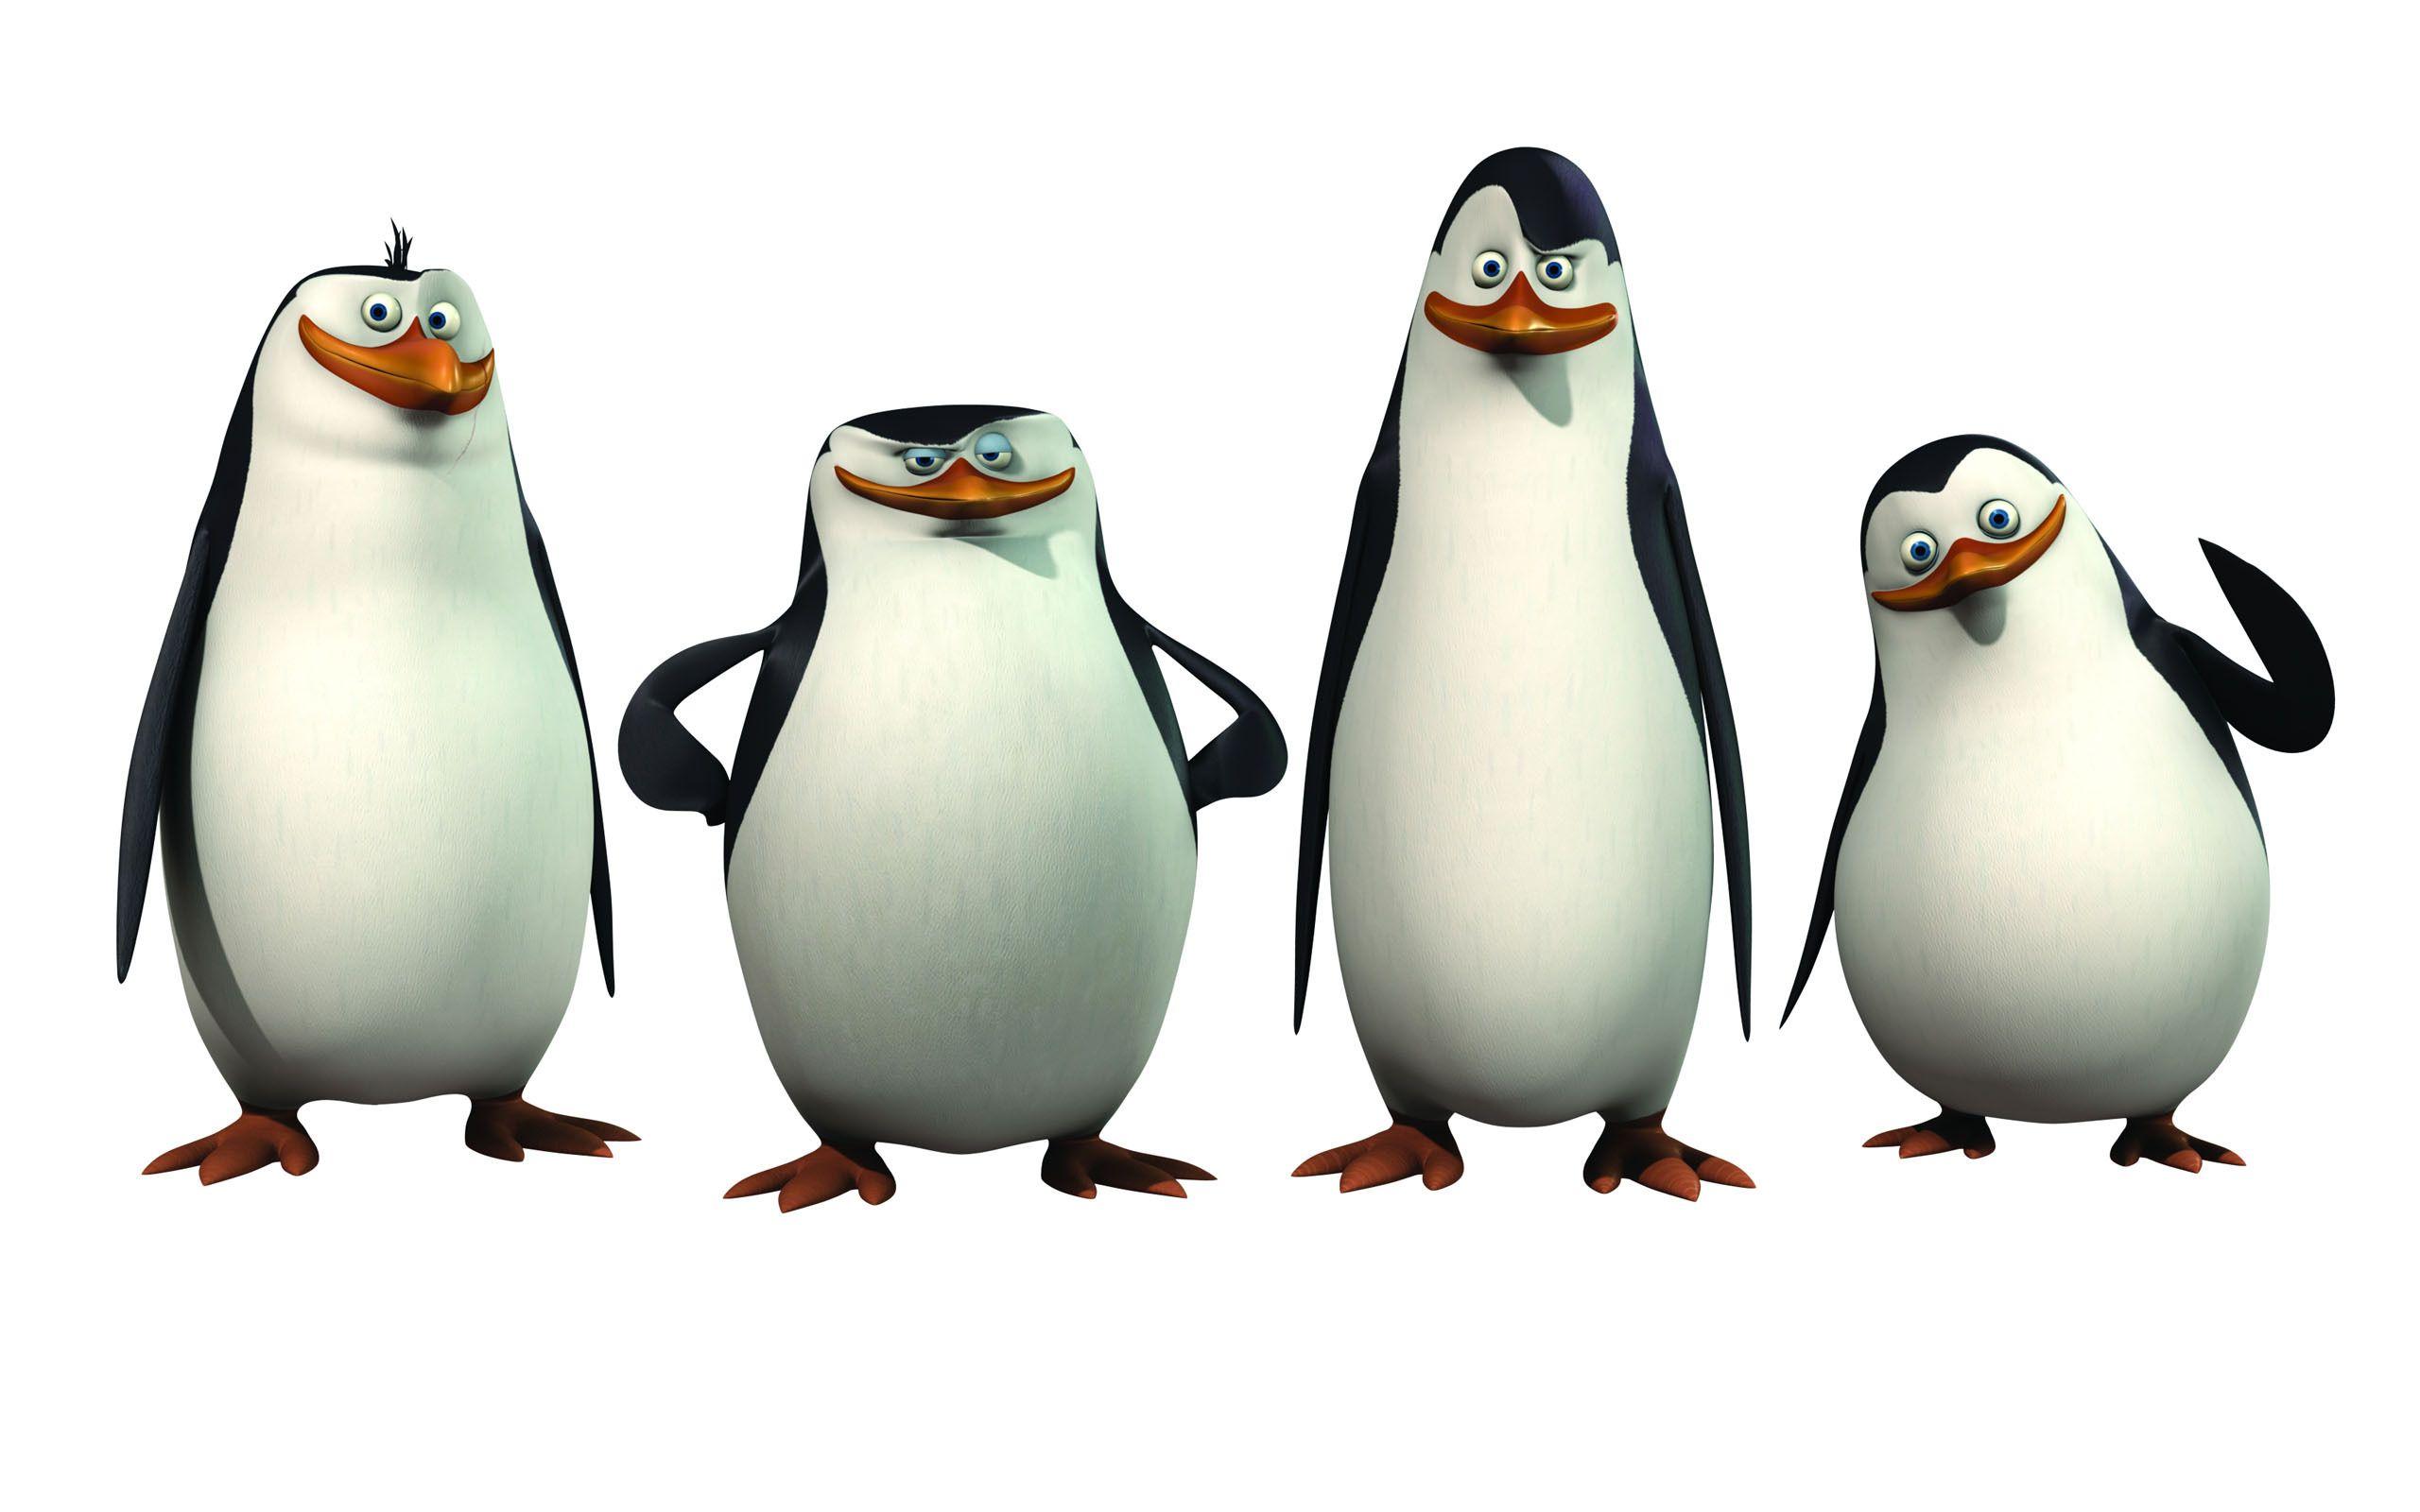 Cartoon Penguins Images.